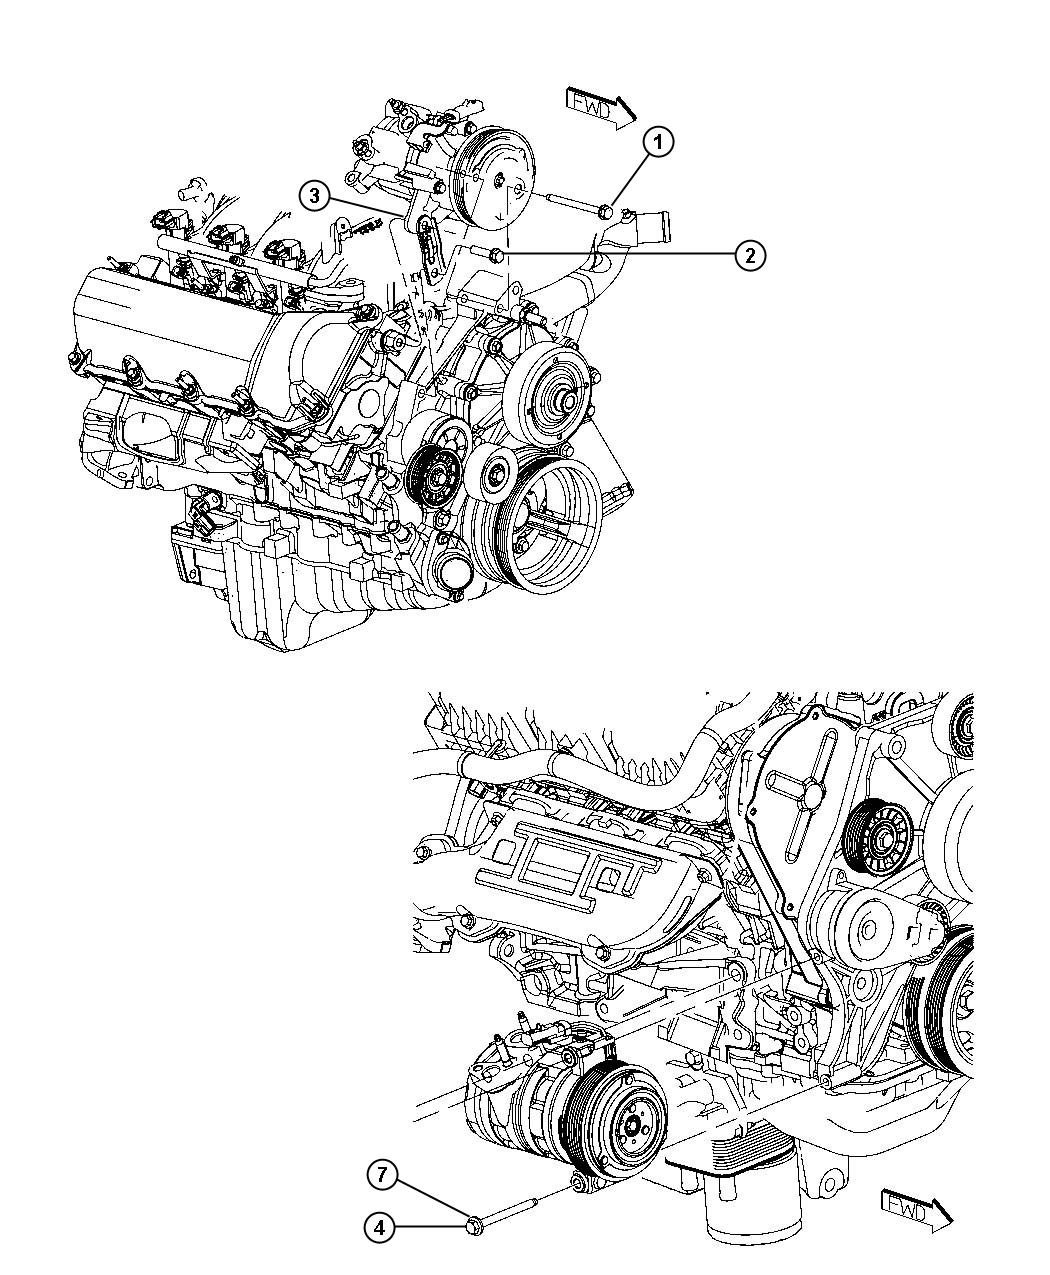 Dodge Nitro Stud. Double ended. M8x1.25x94.00, m8x1.25x98